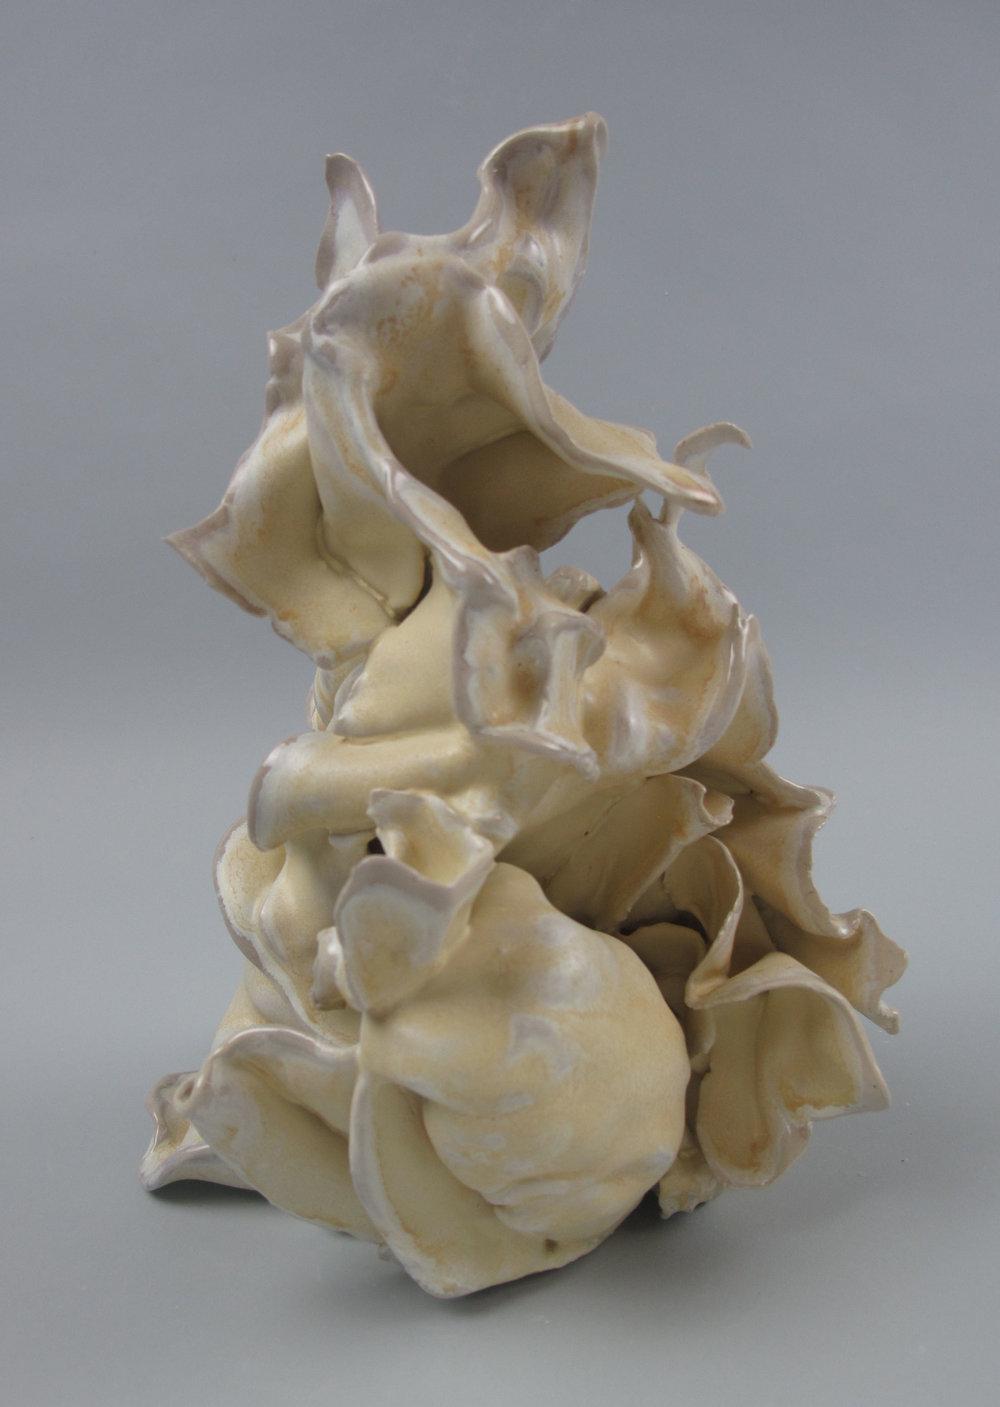 Sara Fine-Wilson,  Grasp , Stoneware, soda-fired, 7x5x4